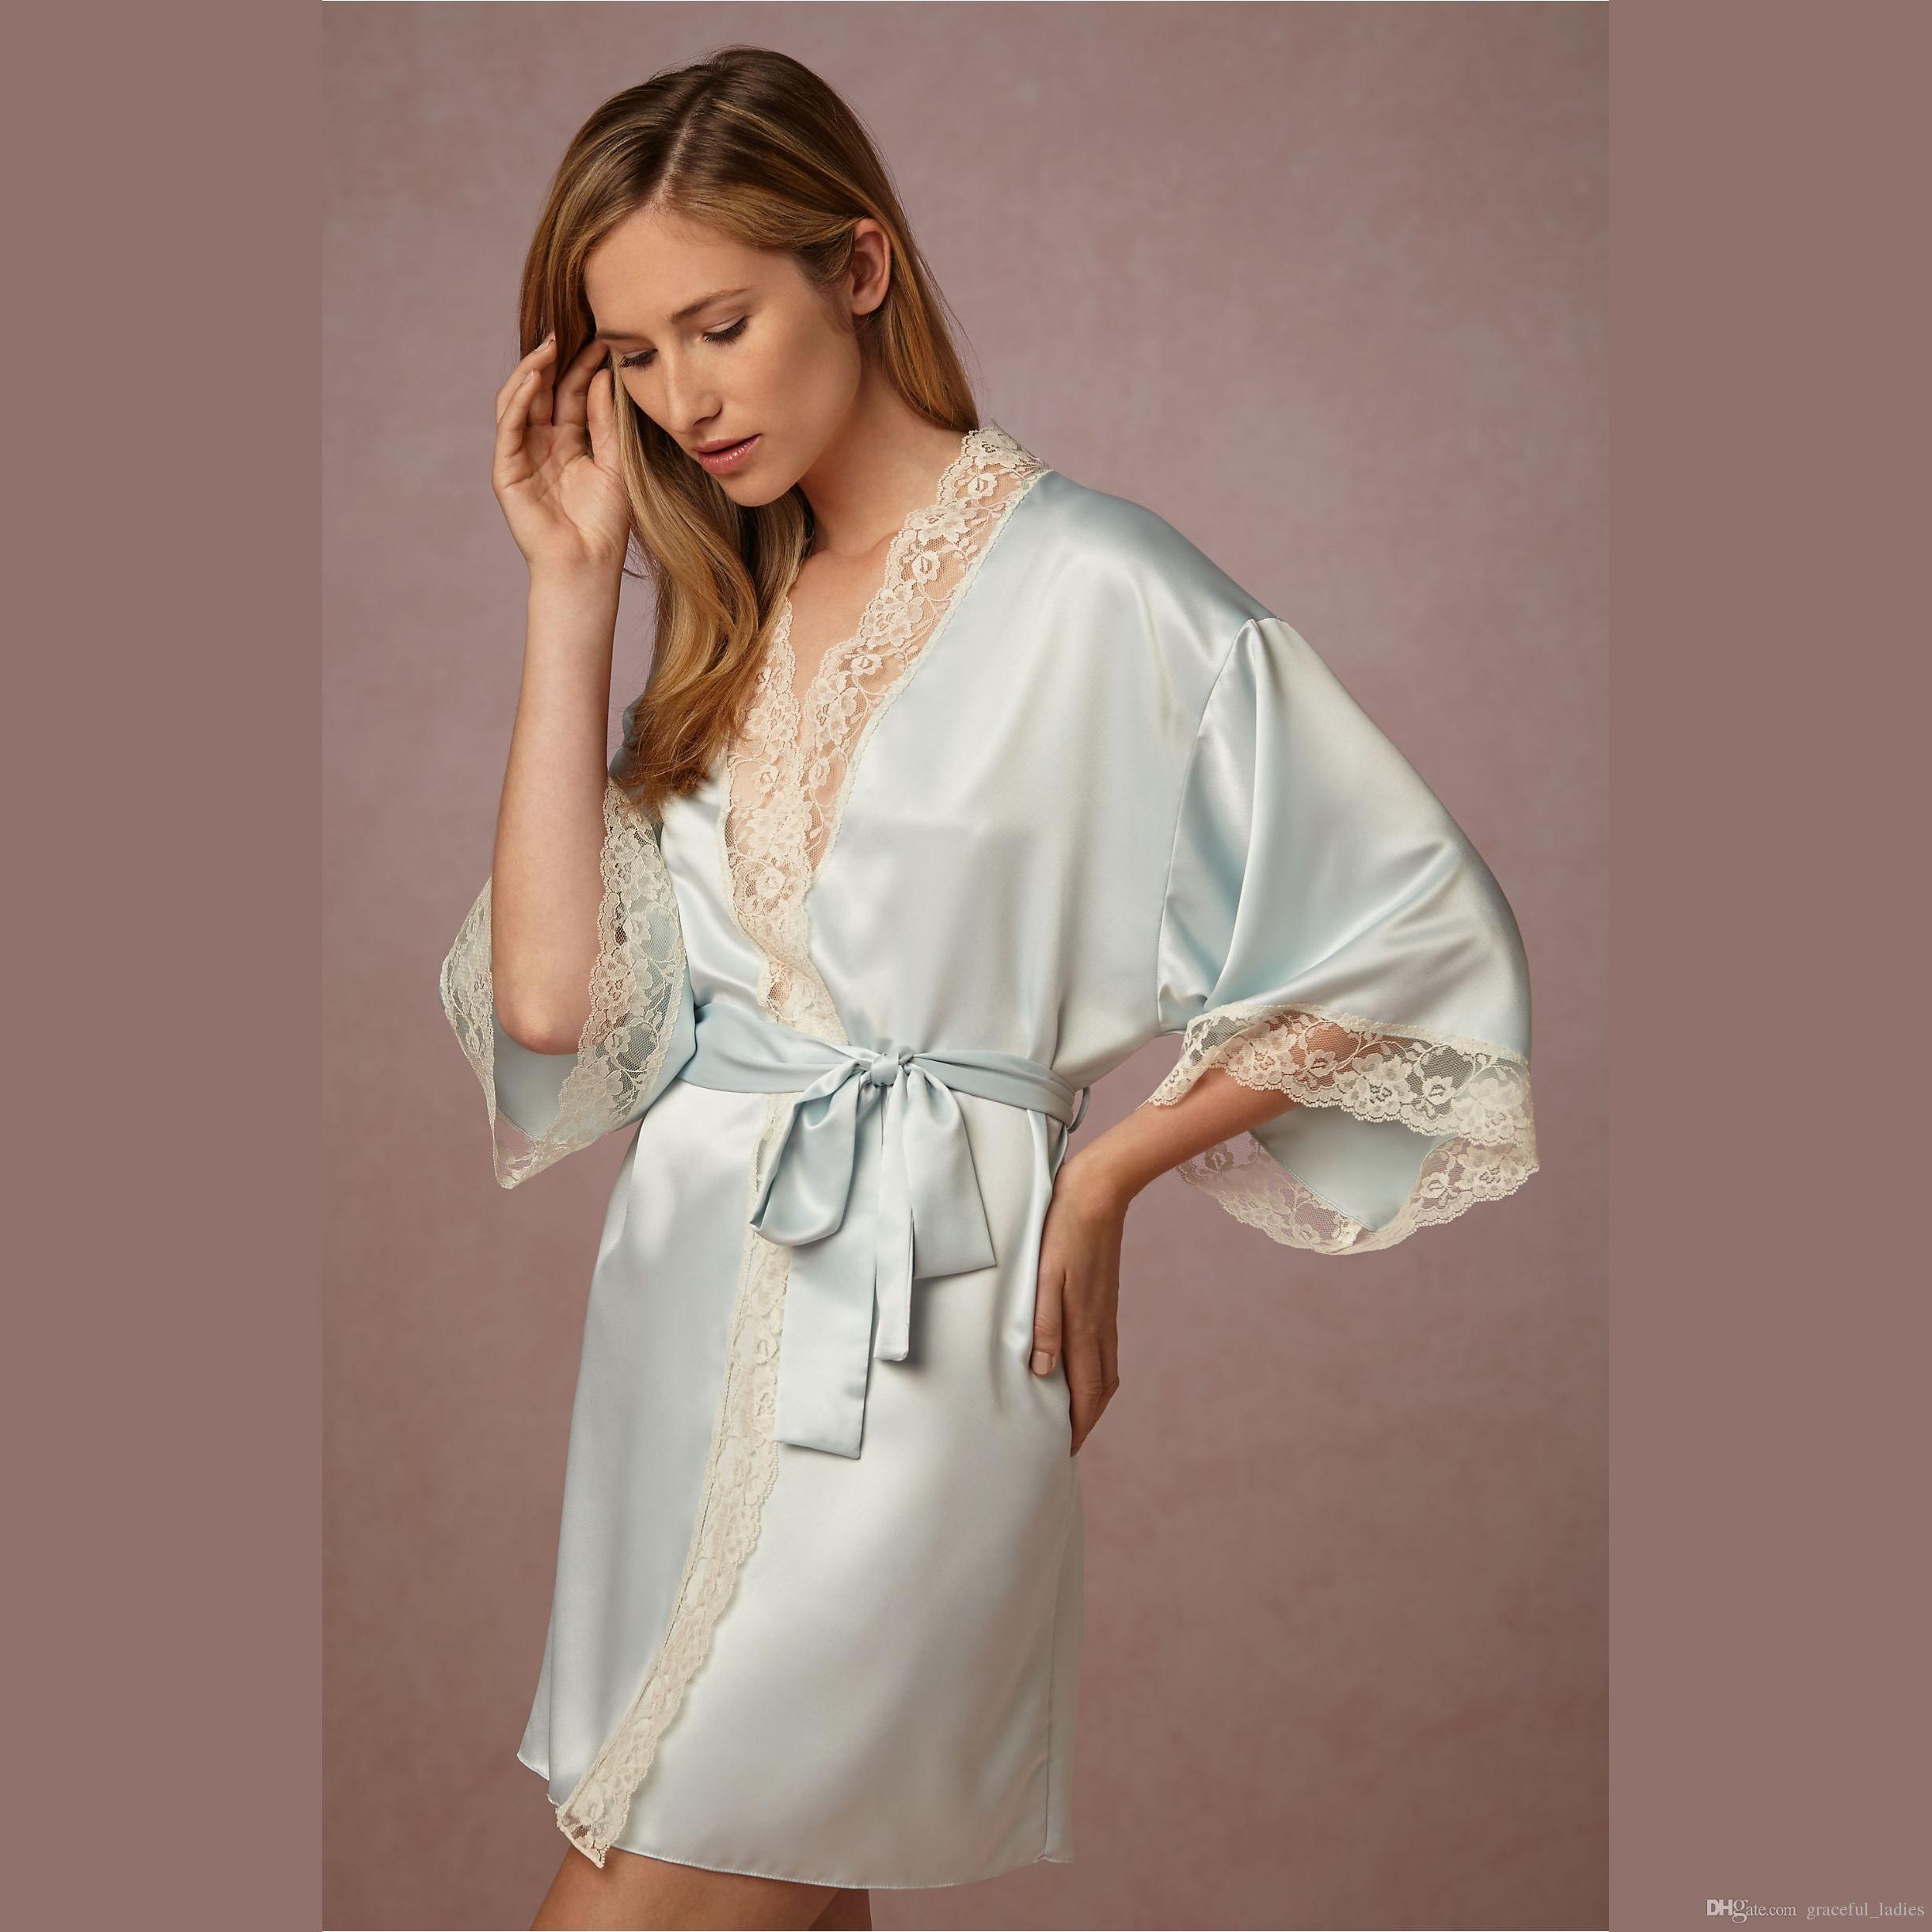 Bridal Shower Light Blue Silk Bridal Undergarments Women